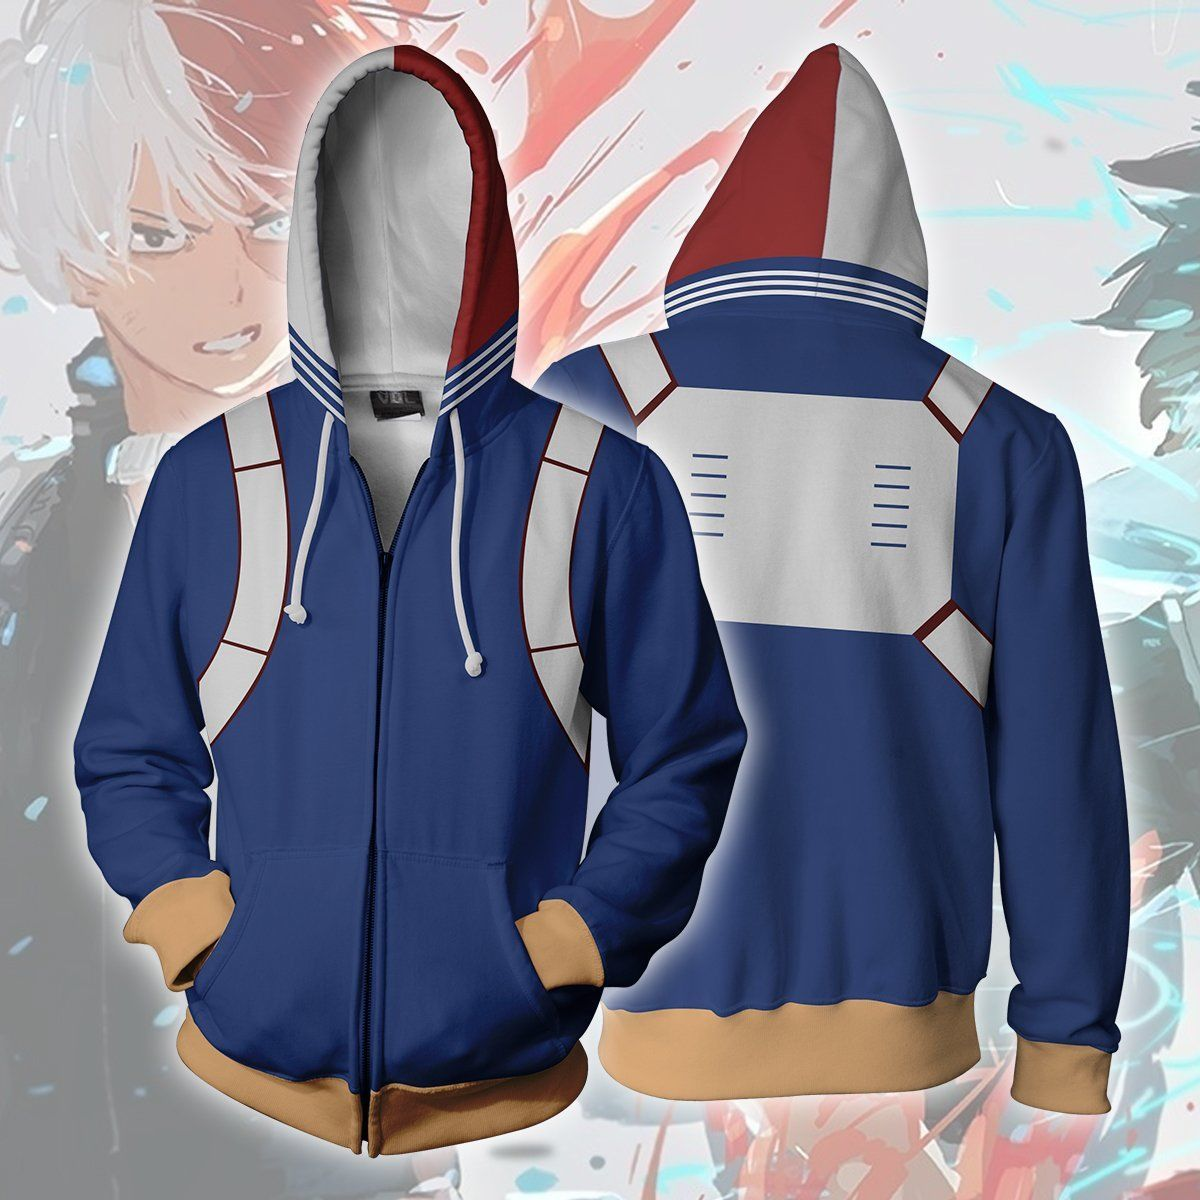 Disfraz mi Boku No Hero Academia Todoroki Shoto con capucha Cosplay chaqueta Anime regalo